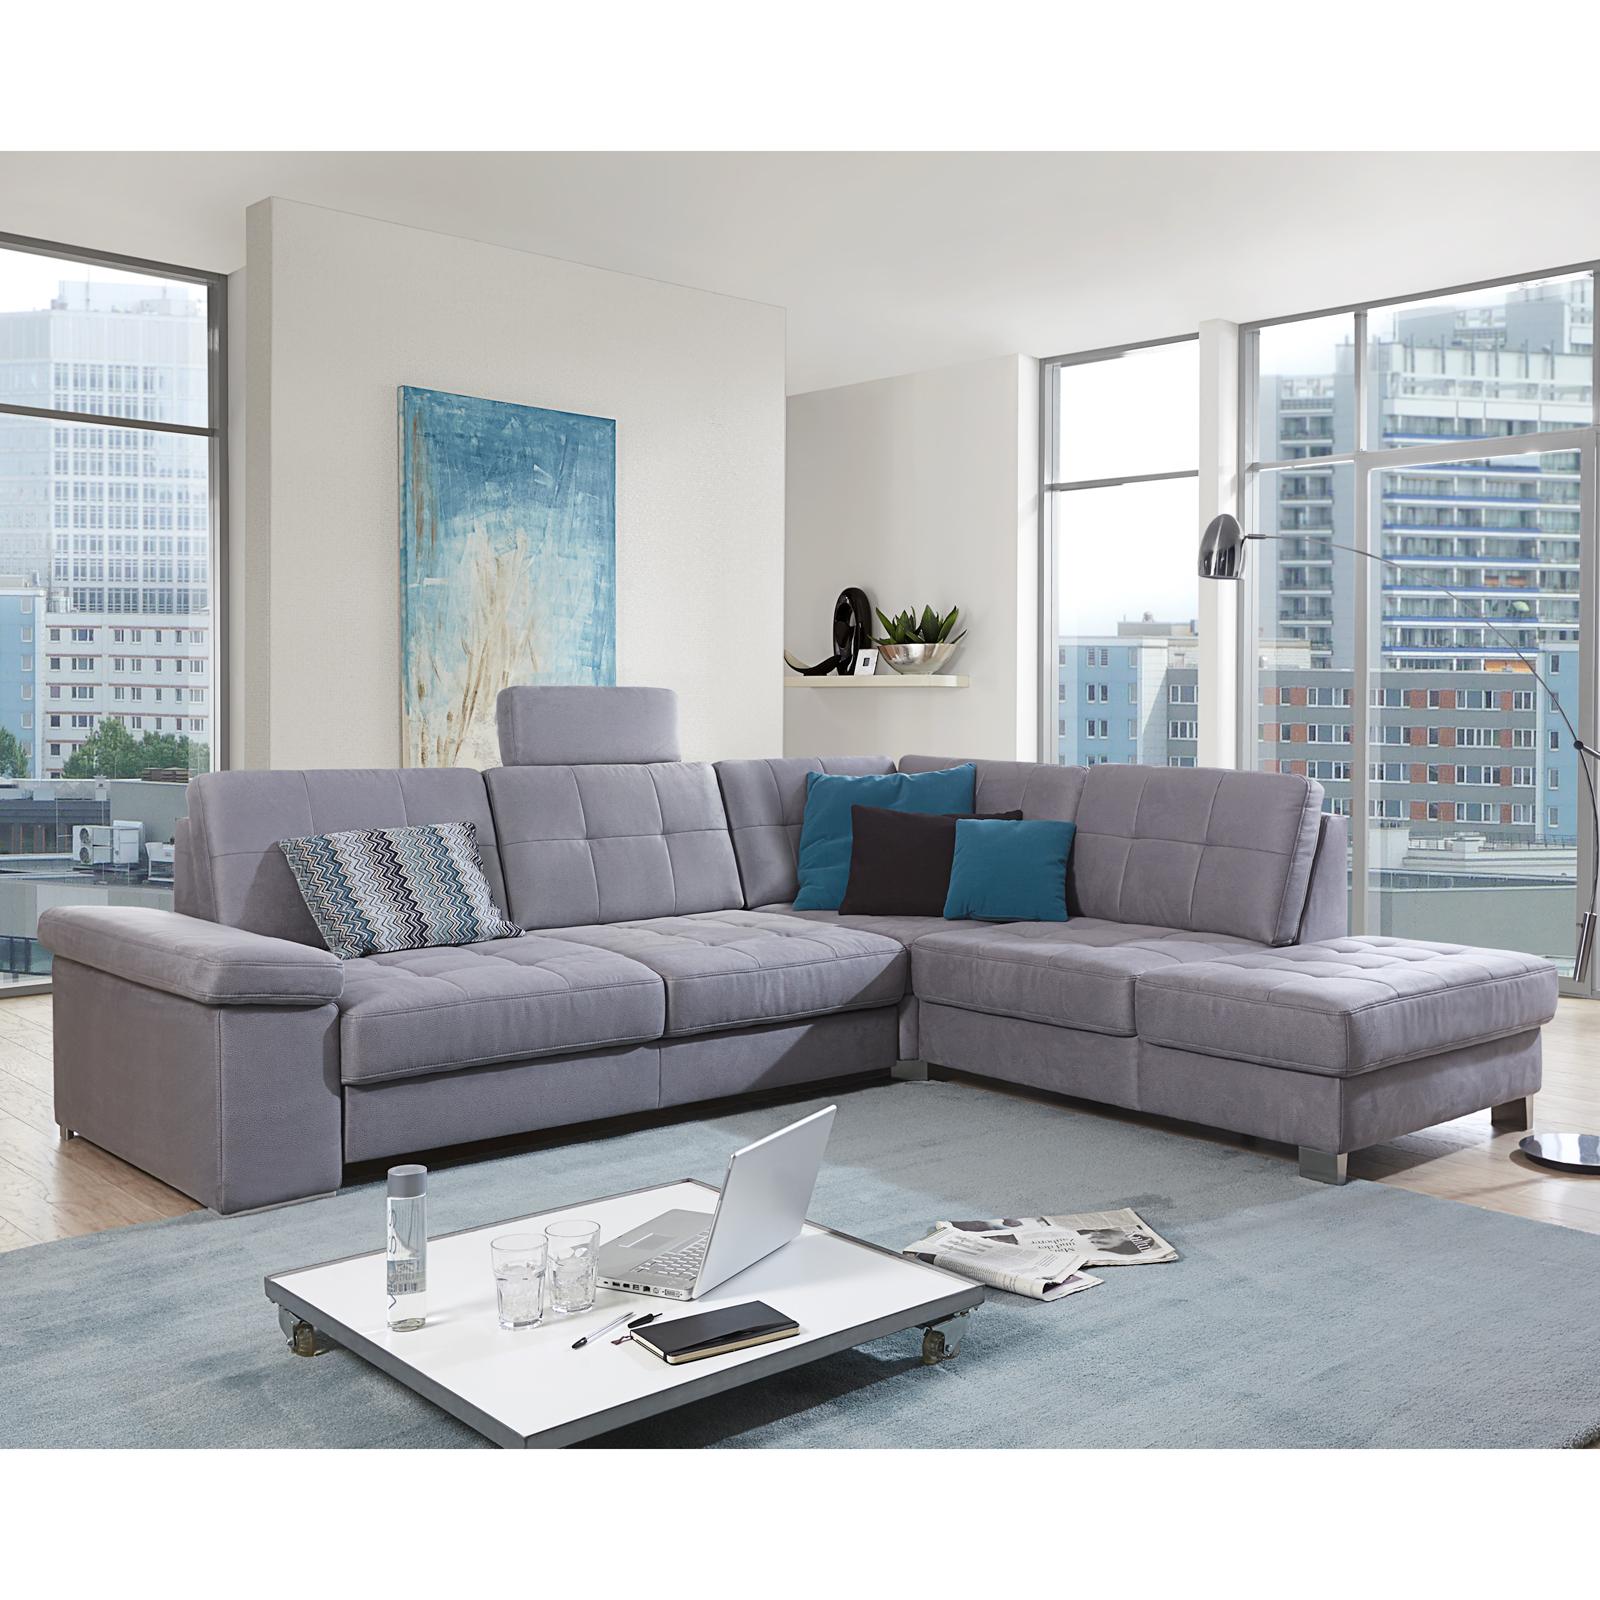 ecksofa puzzle wohnlandschaft sofa polsterm bel in grau. Black Bedroom Furniture Sets. Home Design Ideas